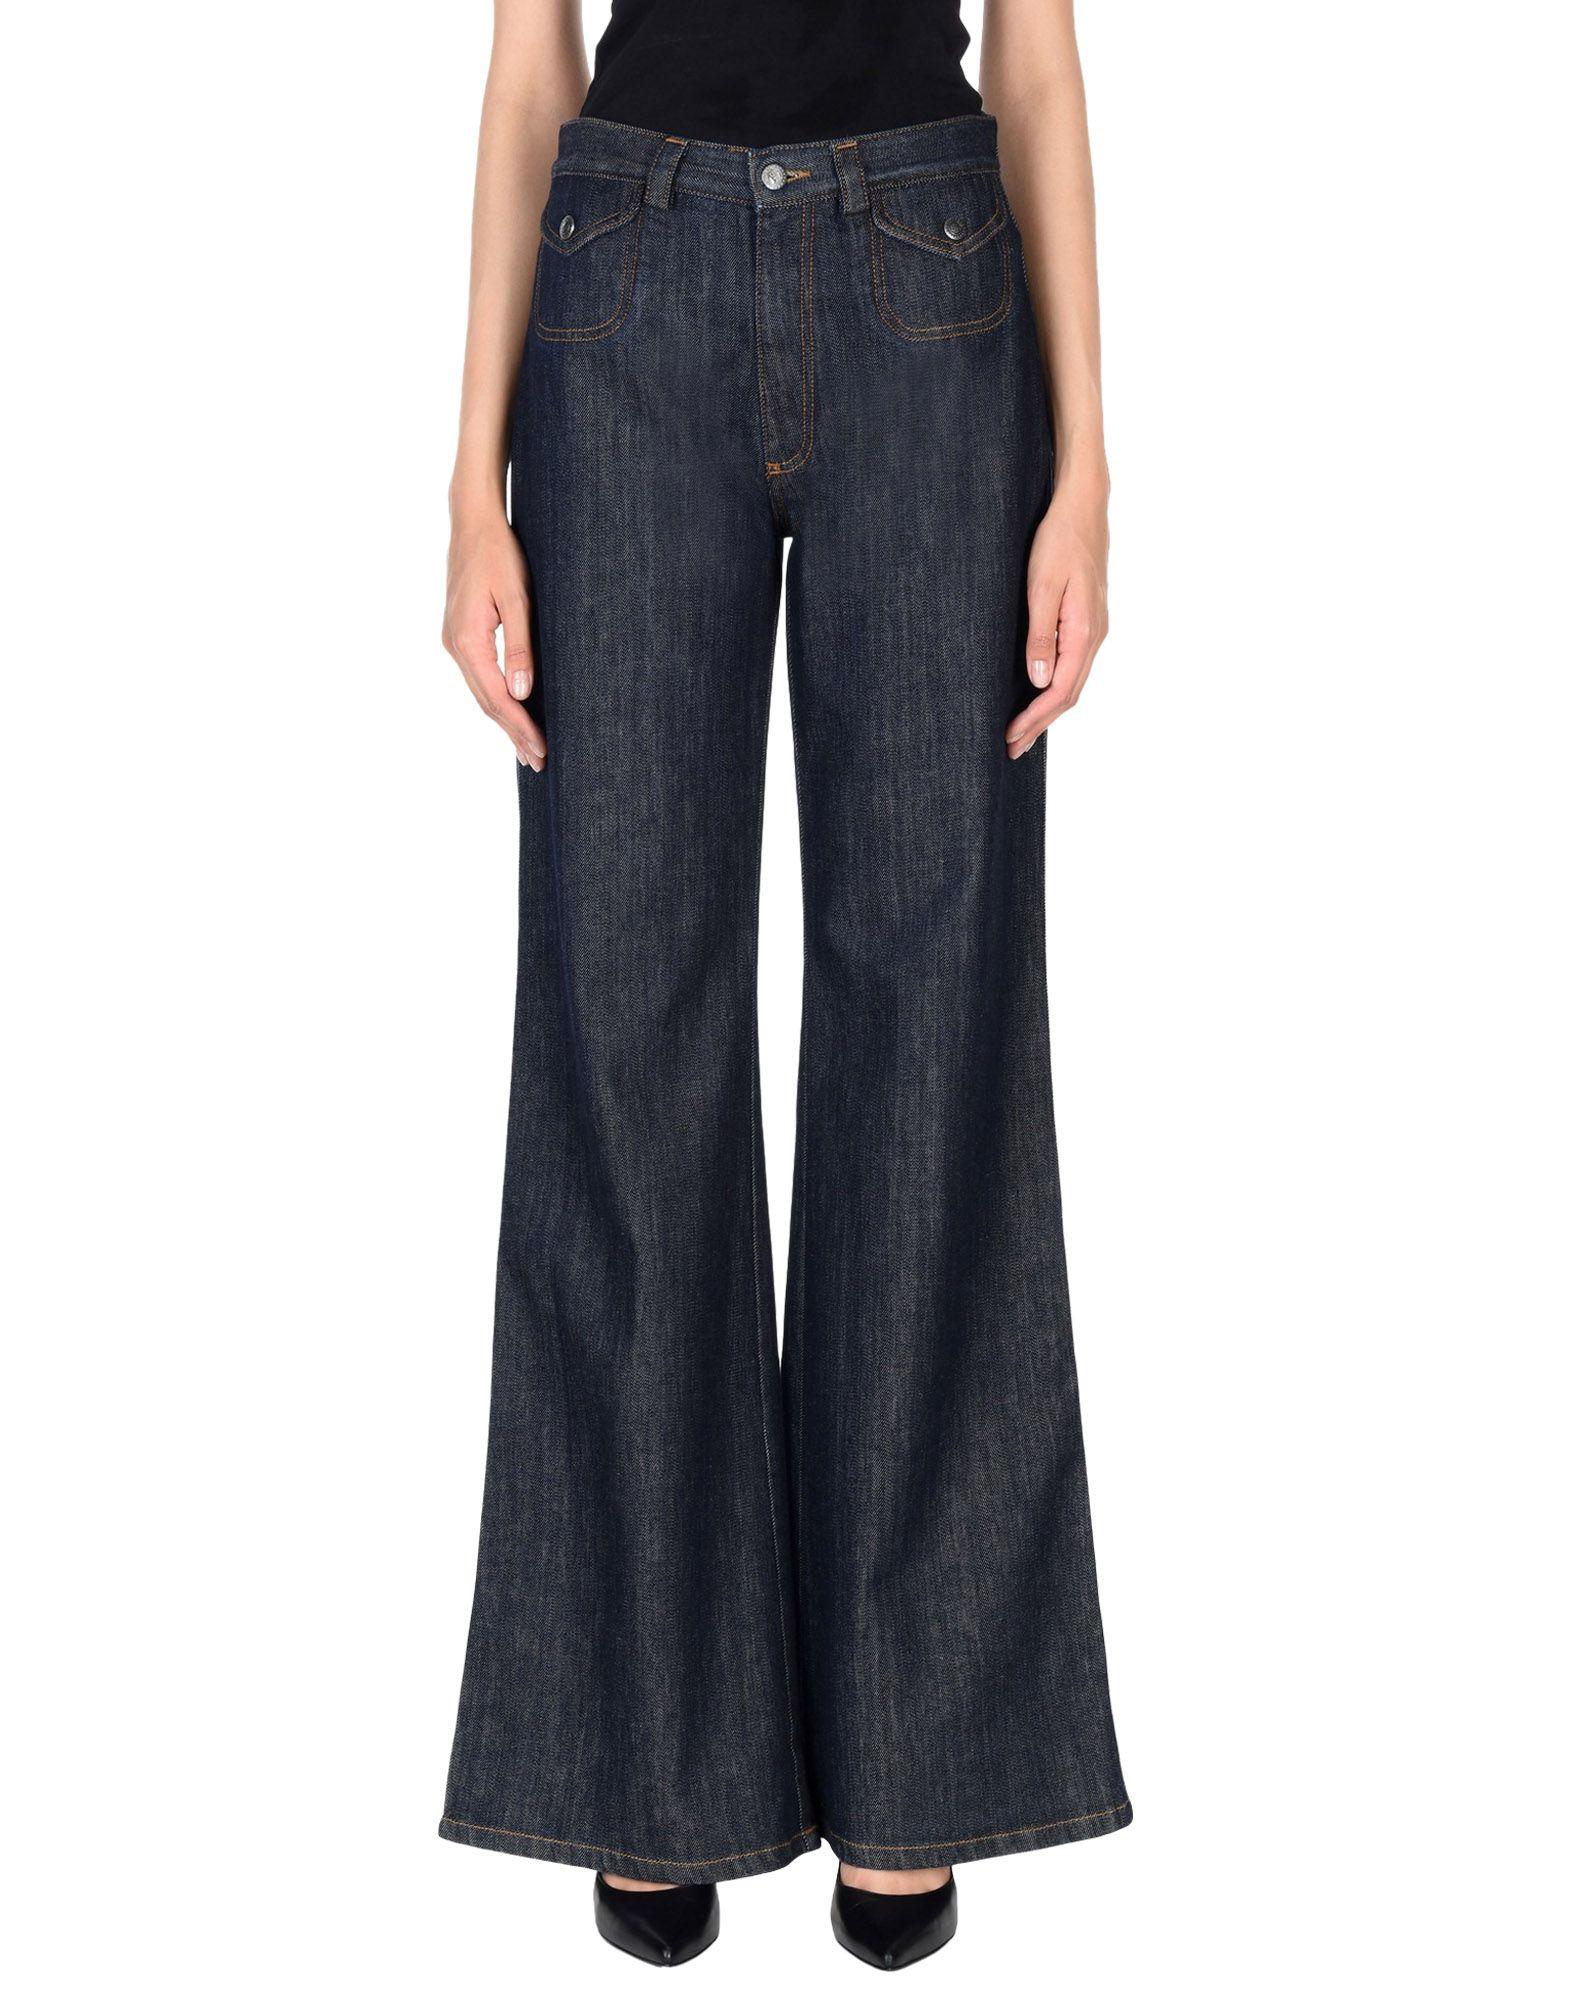 Pantaloni Jeans Sonia Rykiel Donna - Acquista online su HmIIOLIF